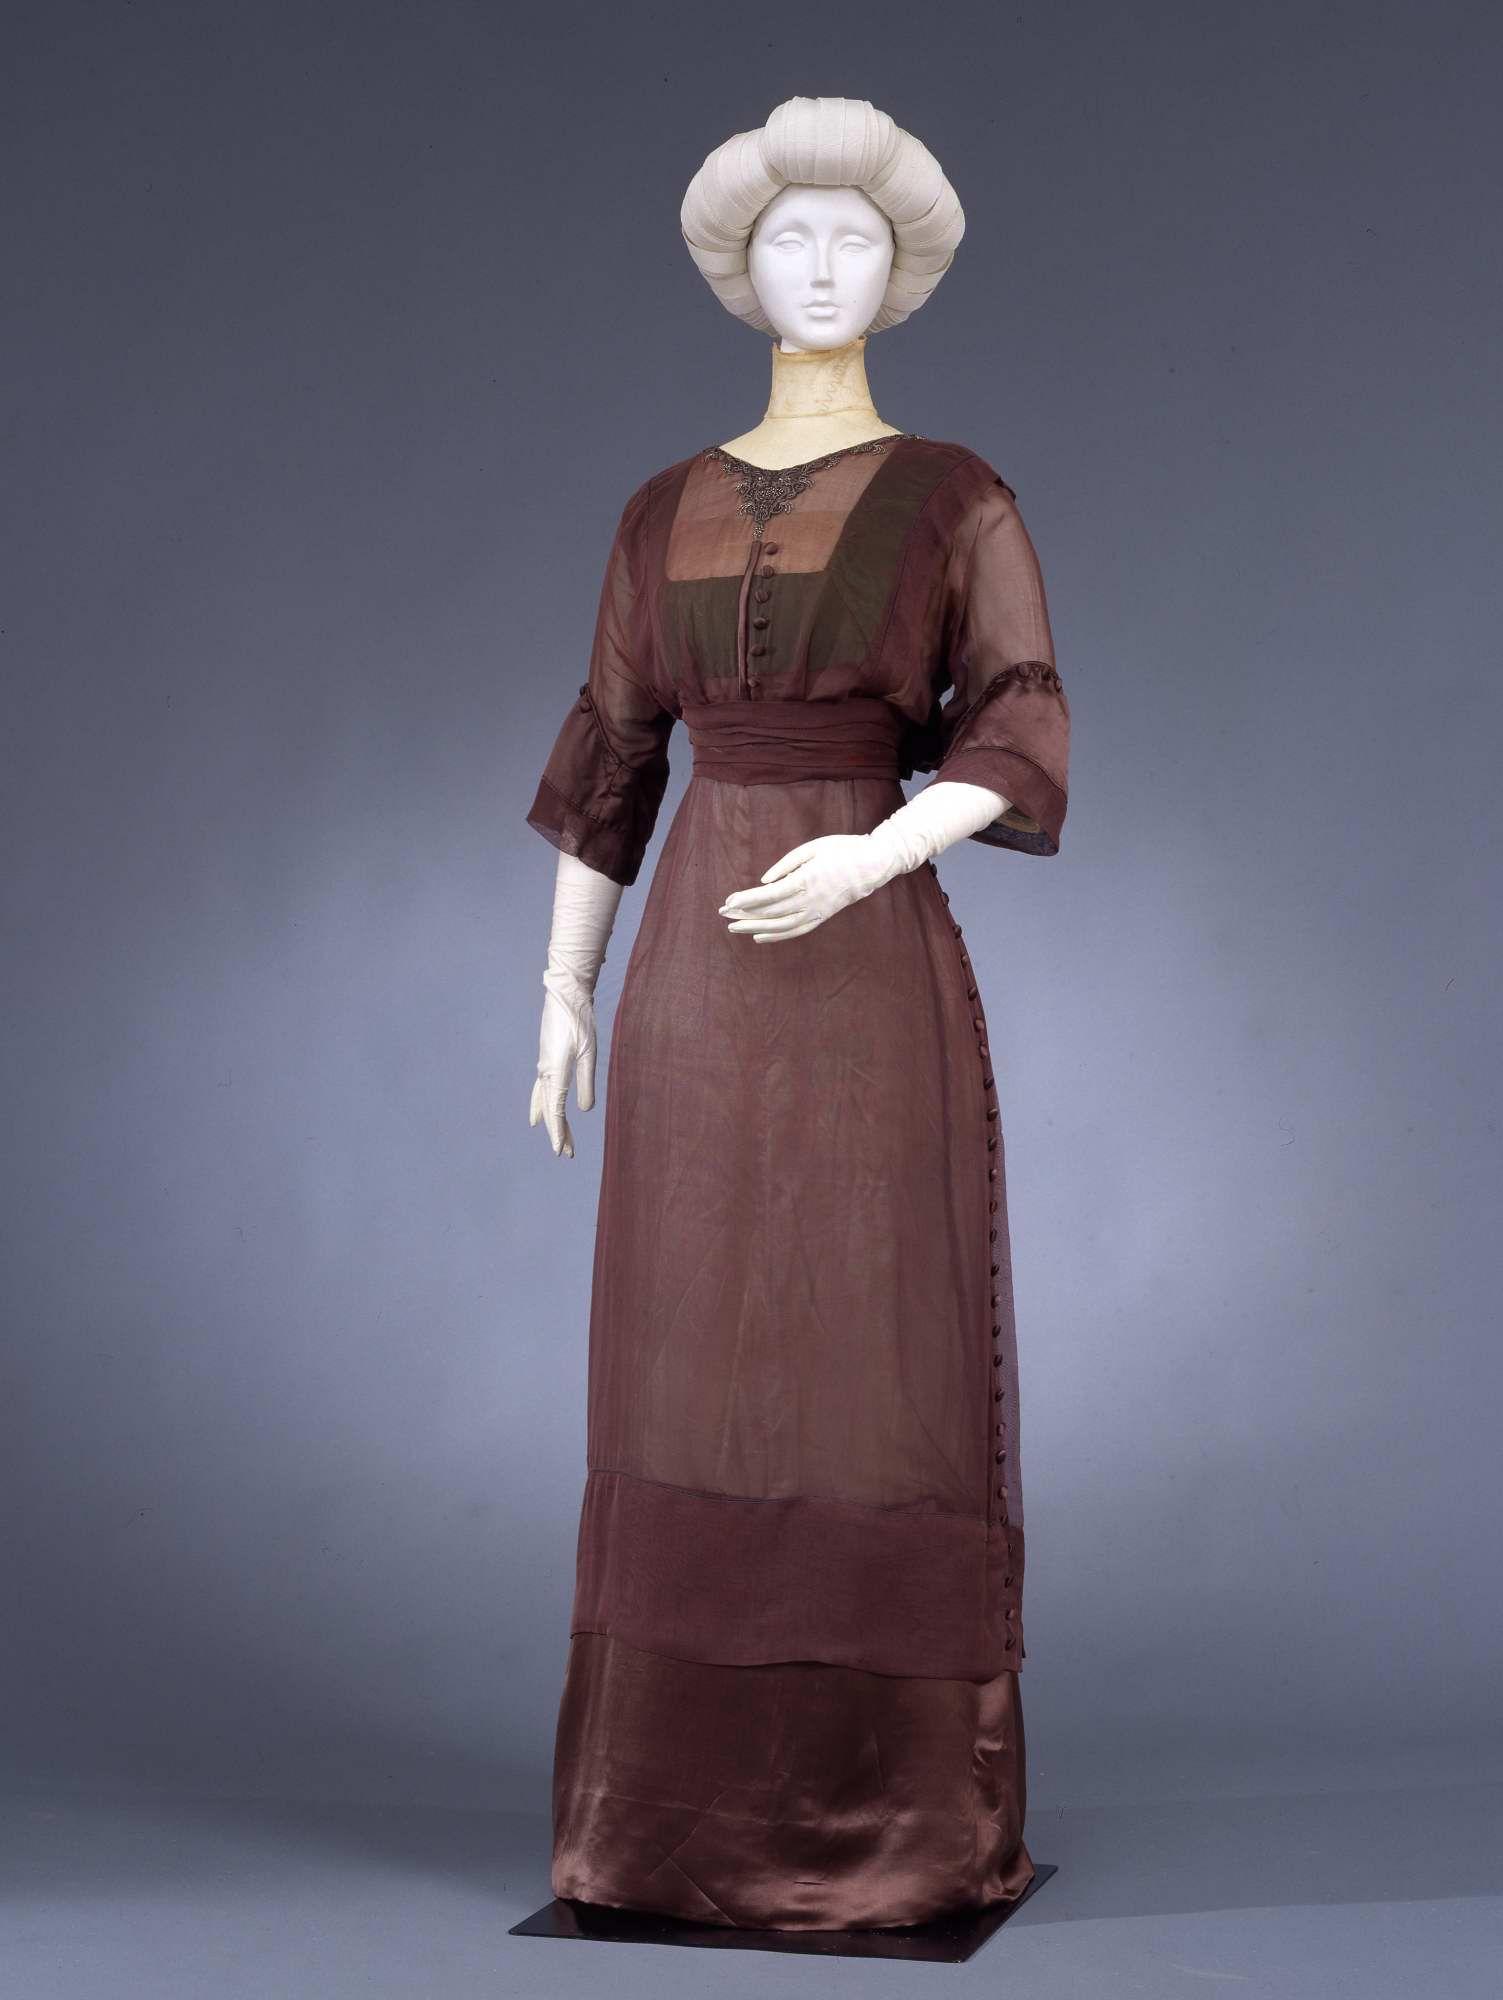 1912 - Dress - Silk muslin, satin, metallic beads, silk thread embroidery, cotton Leavers lace, cotton tulle, chiffon